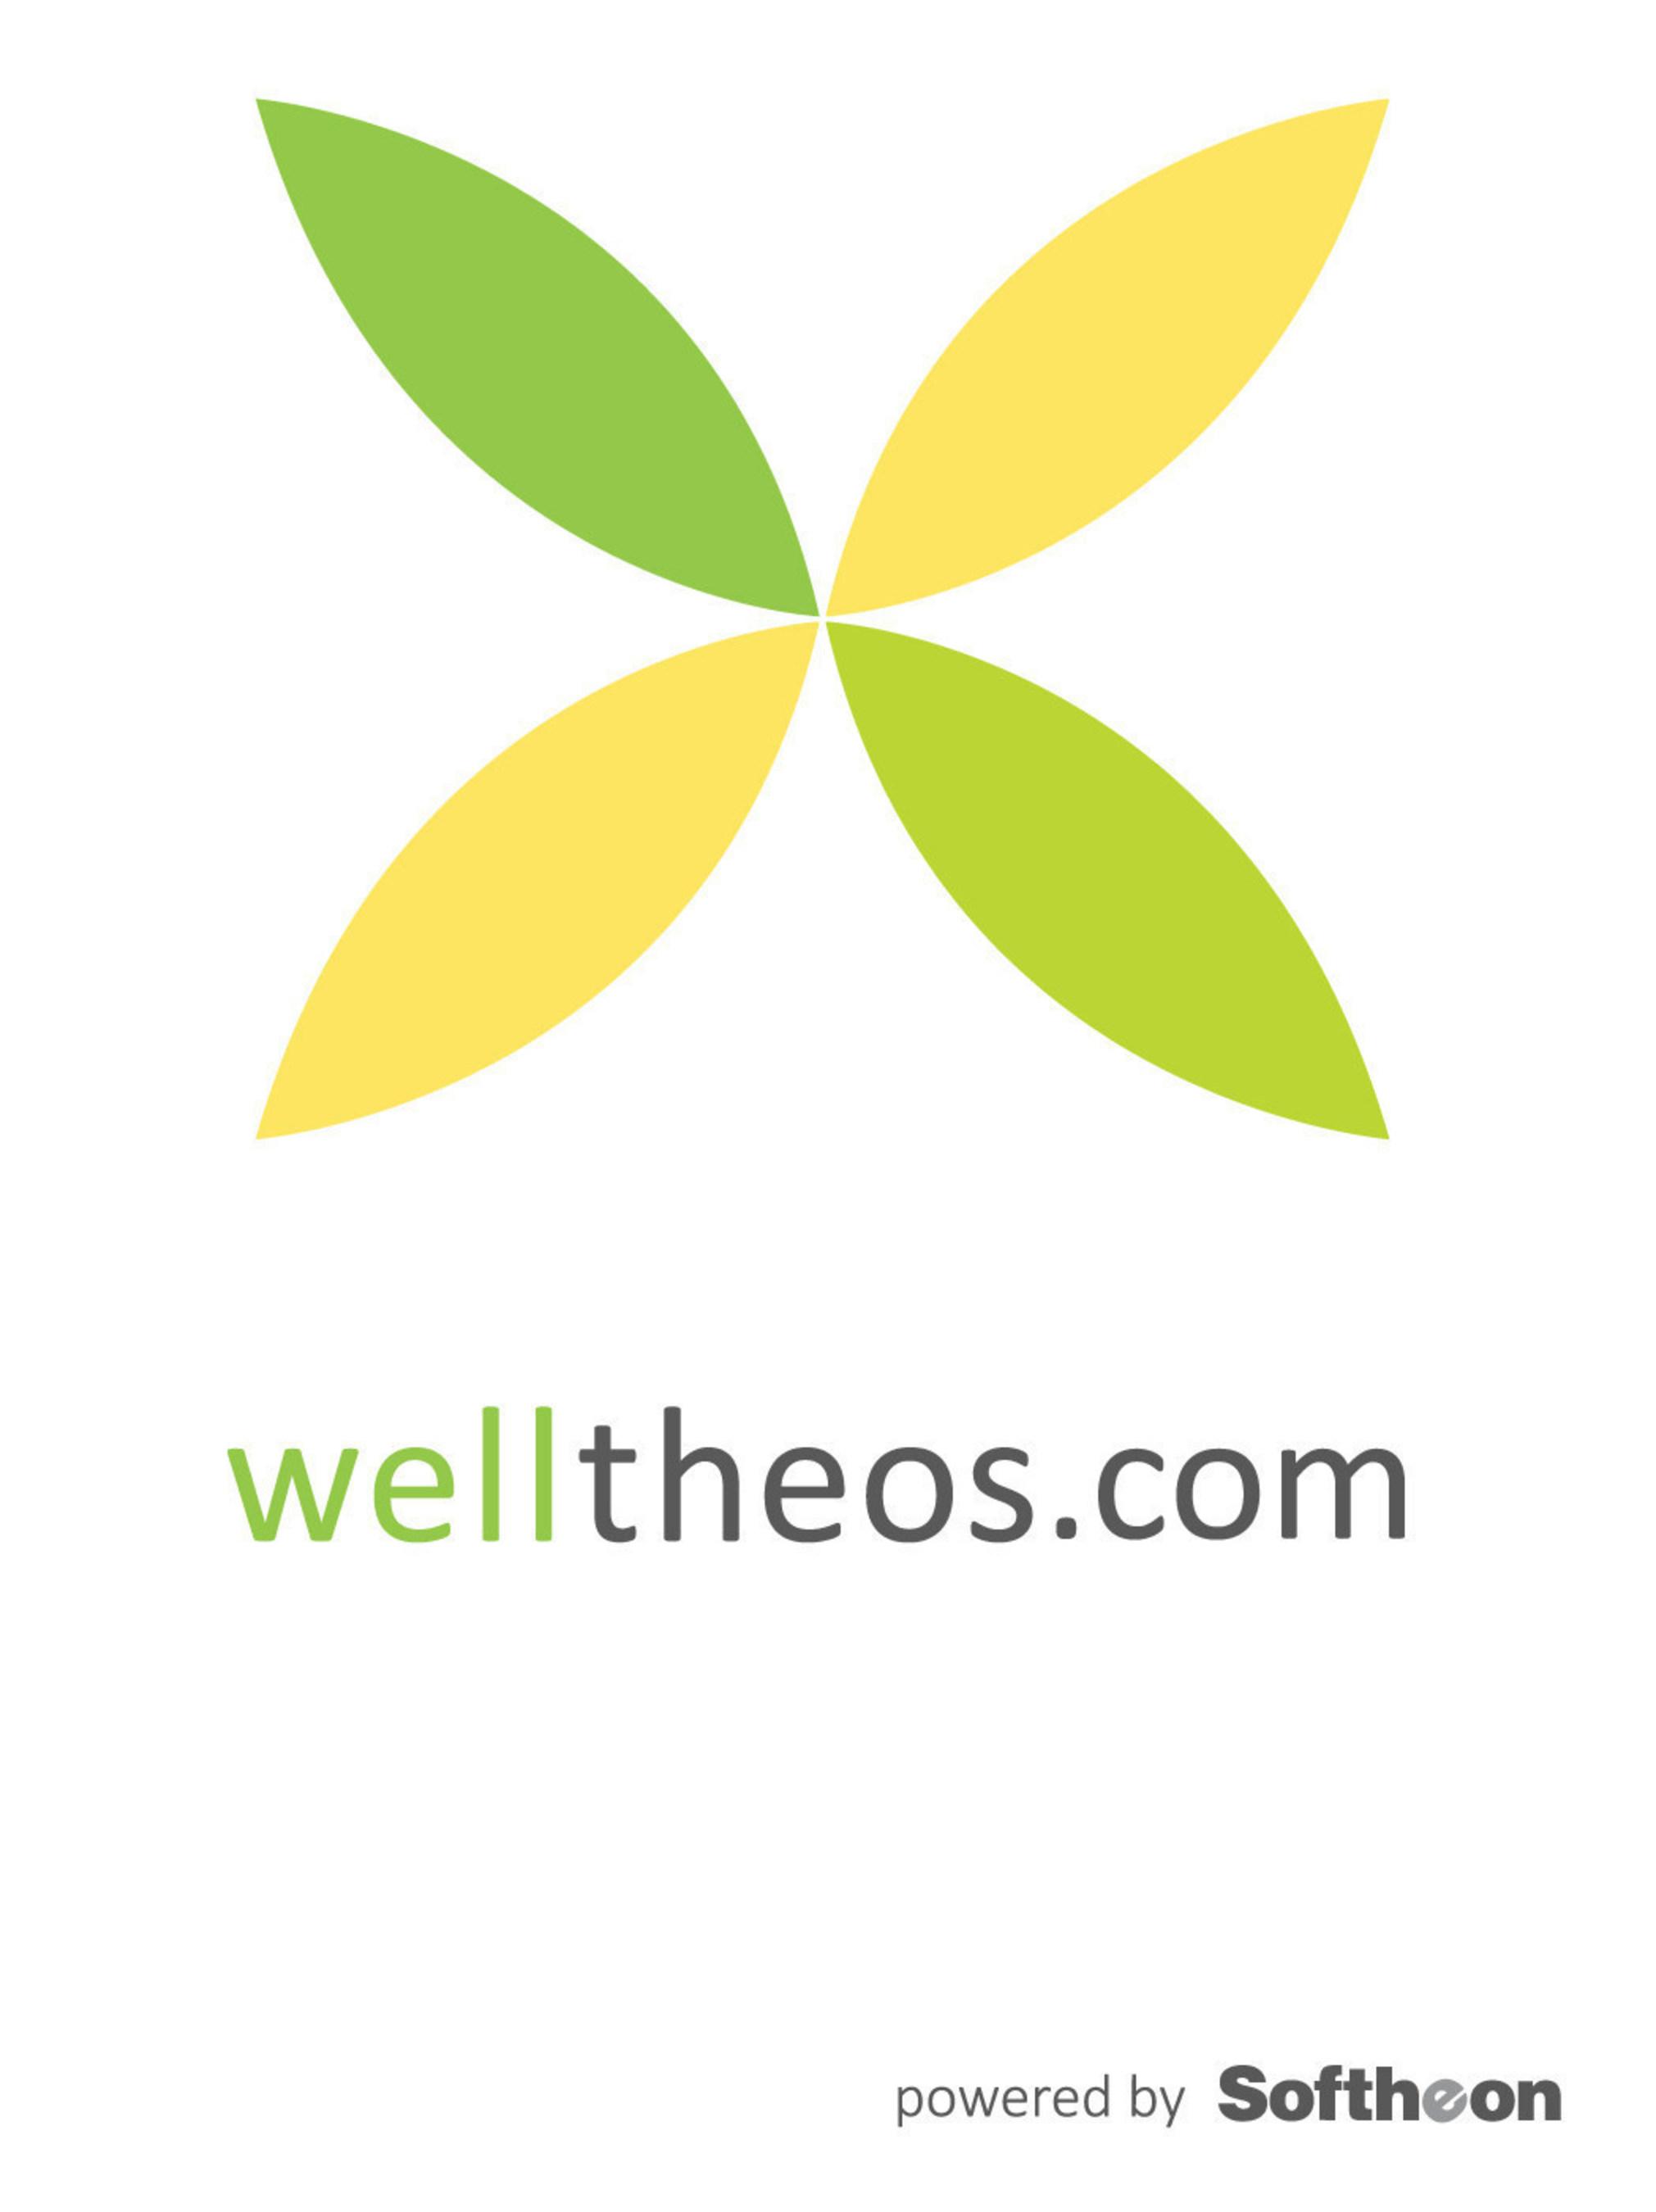 Welltheos